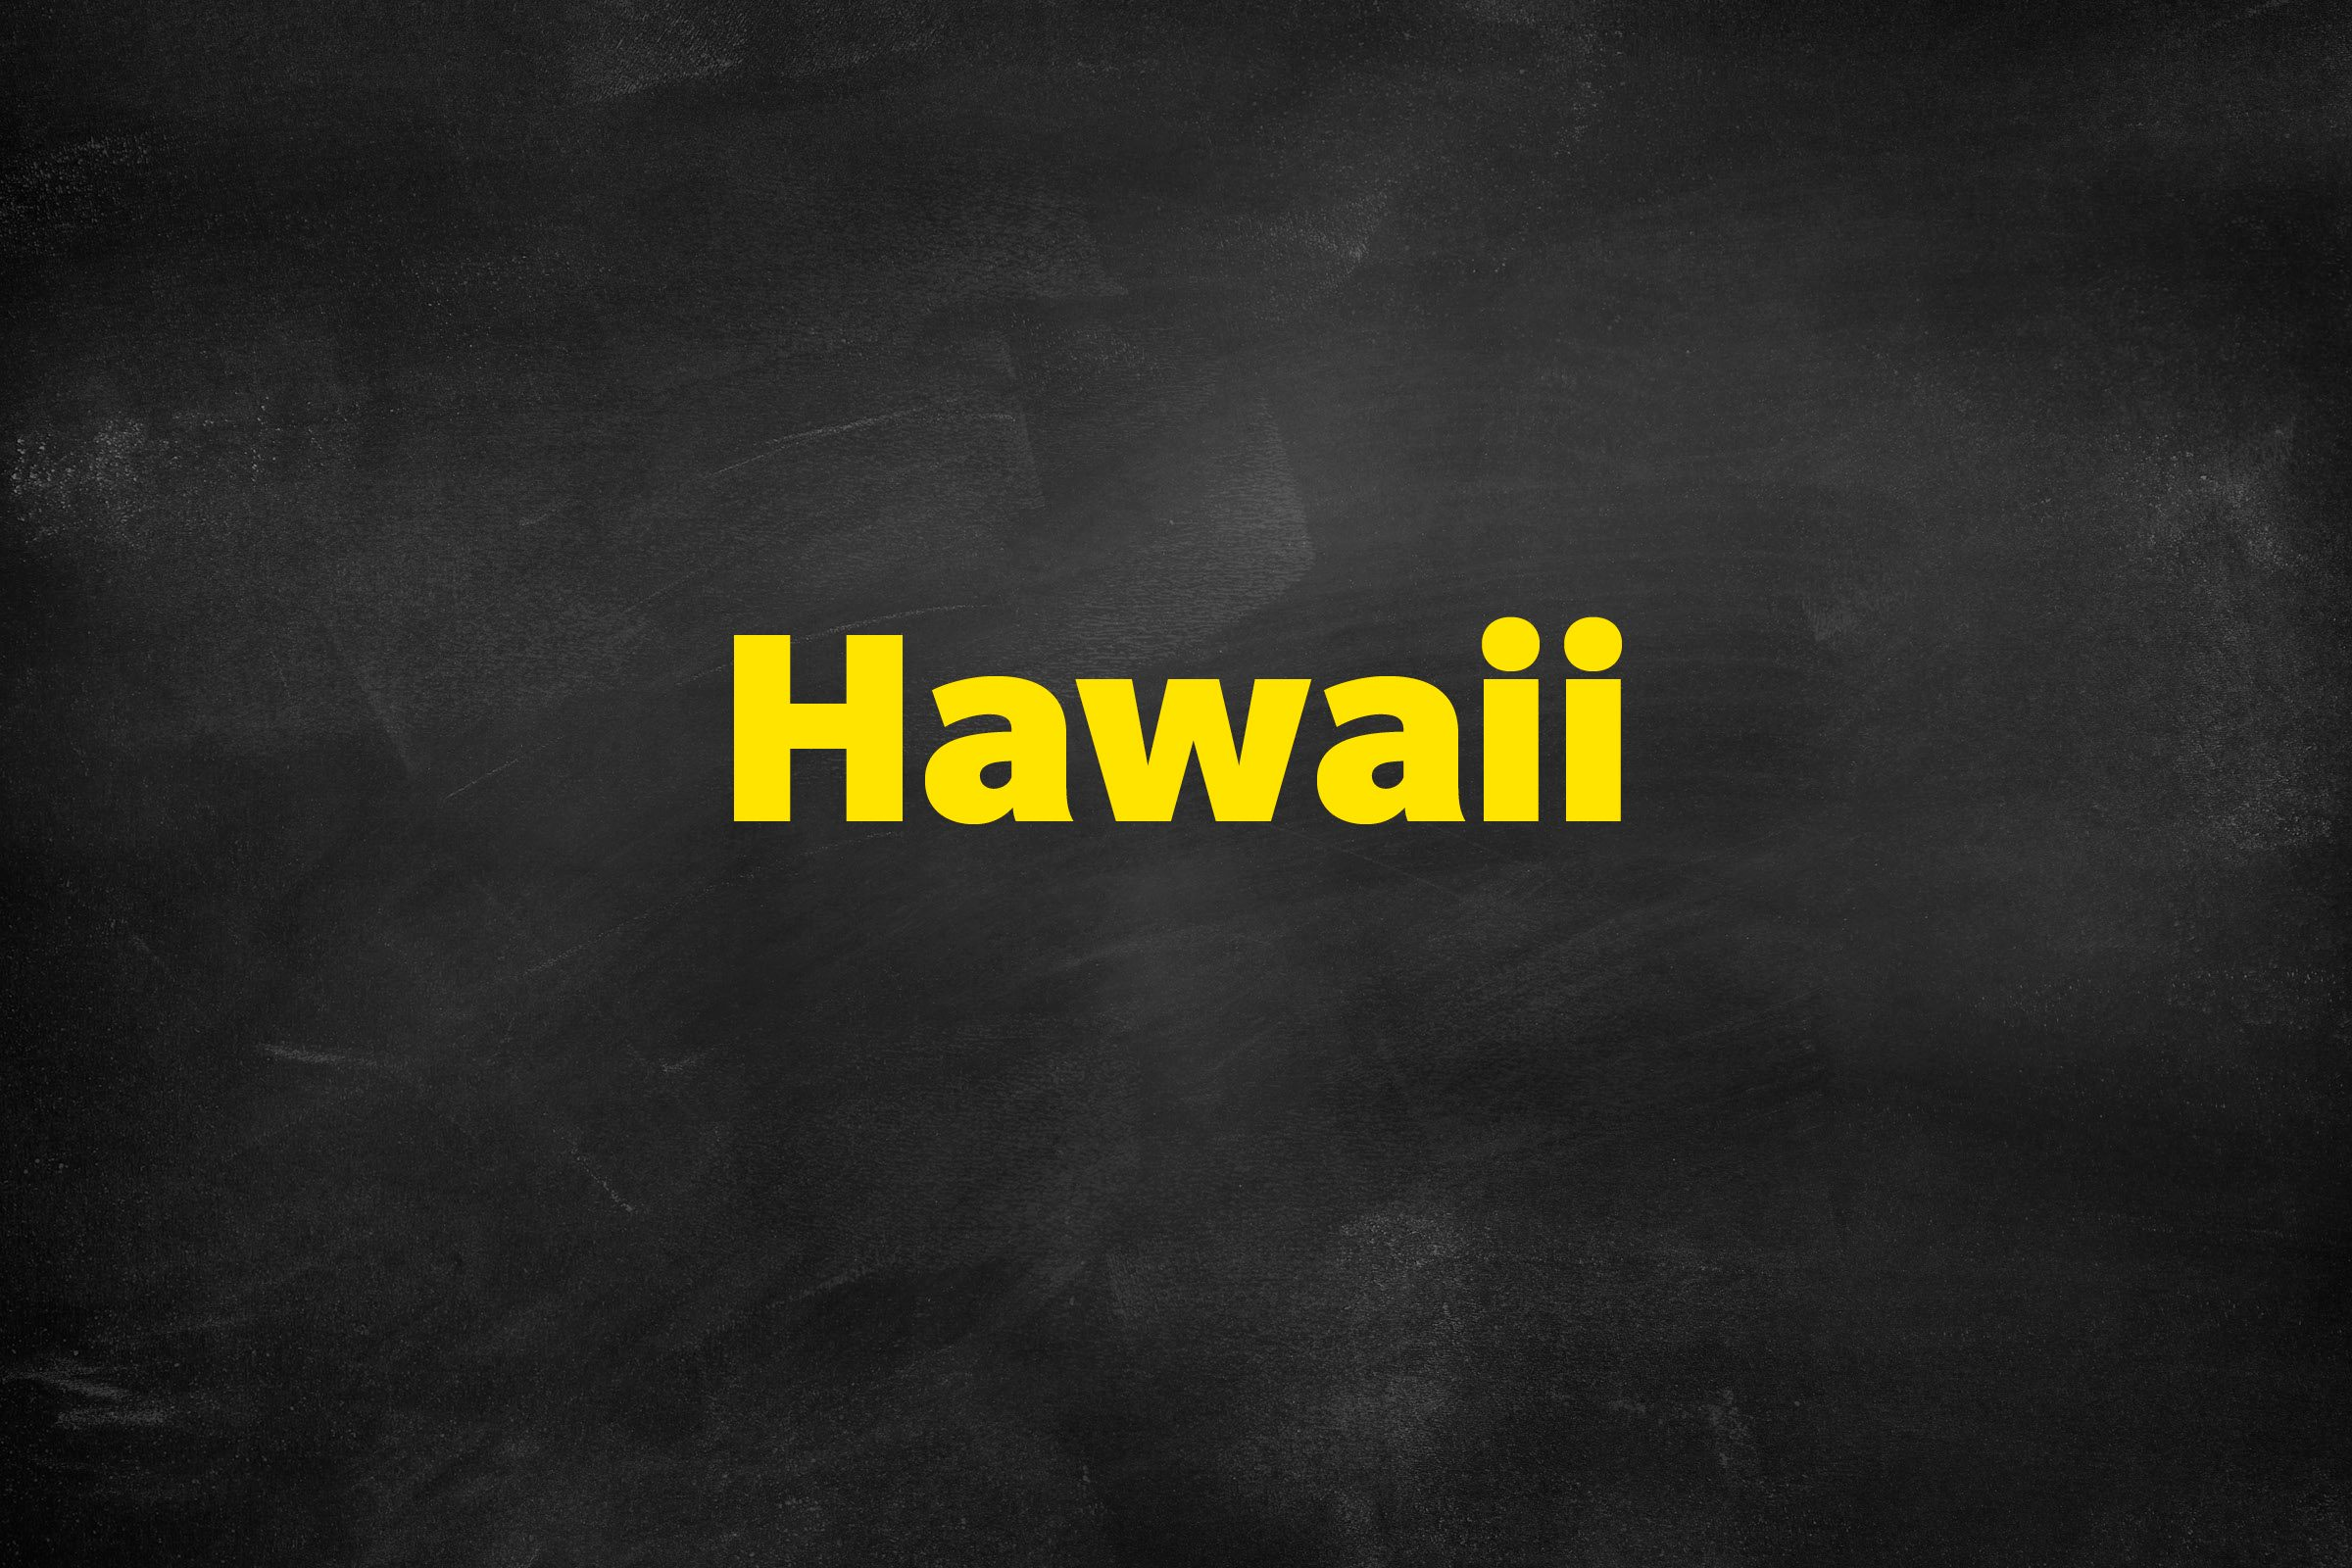 Answer: Hawaii